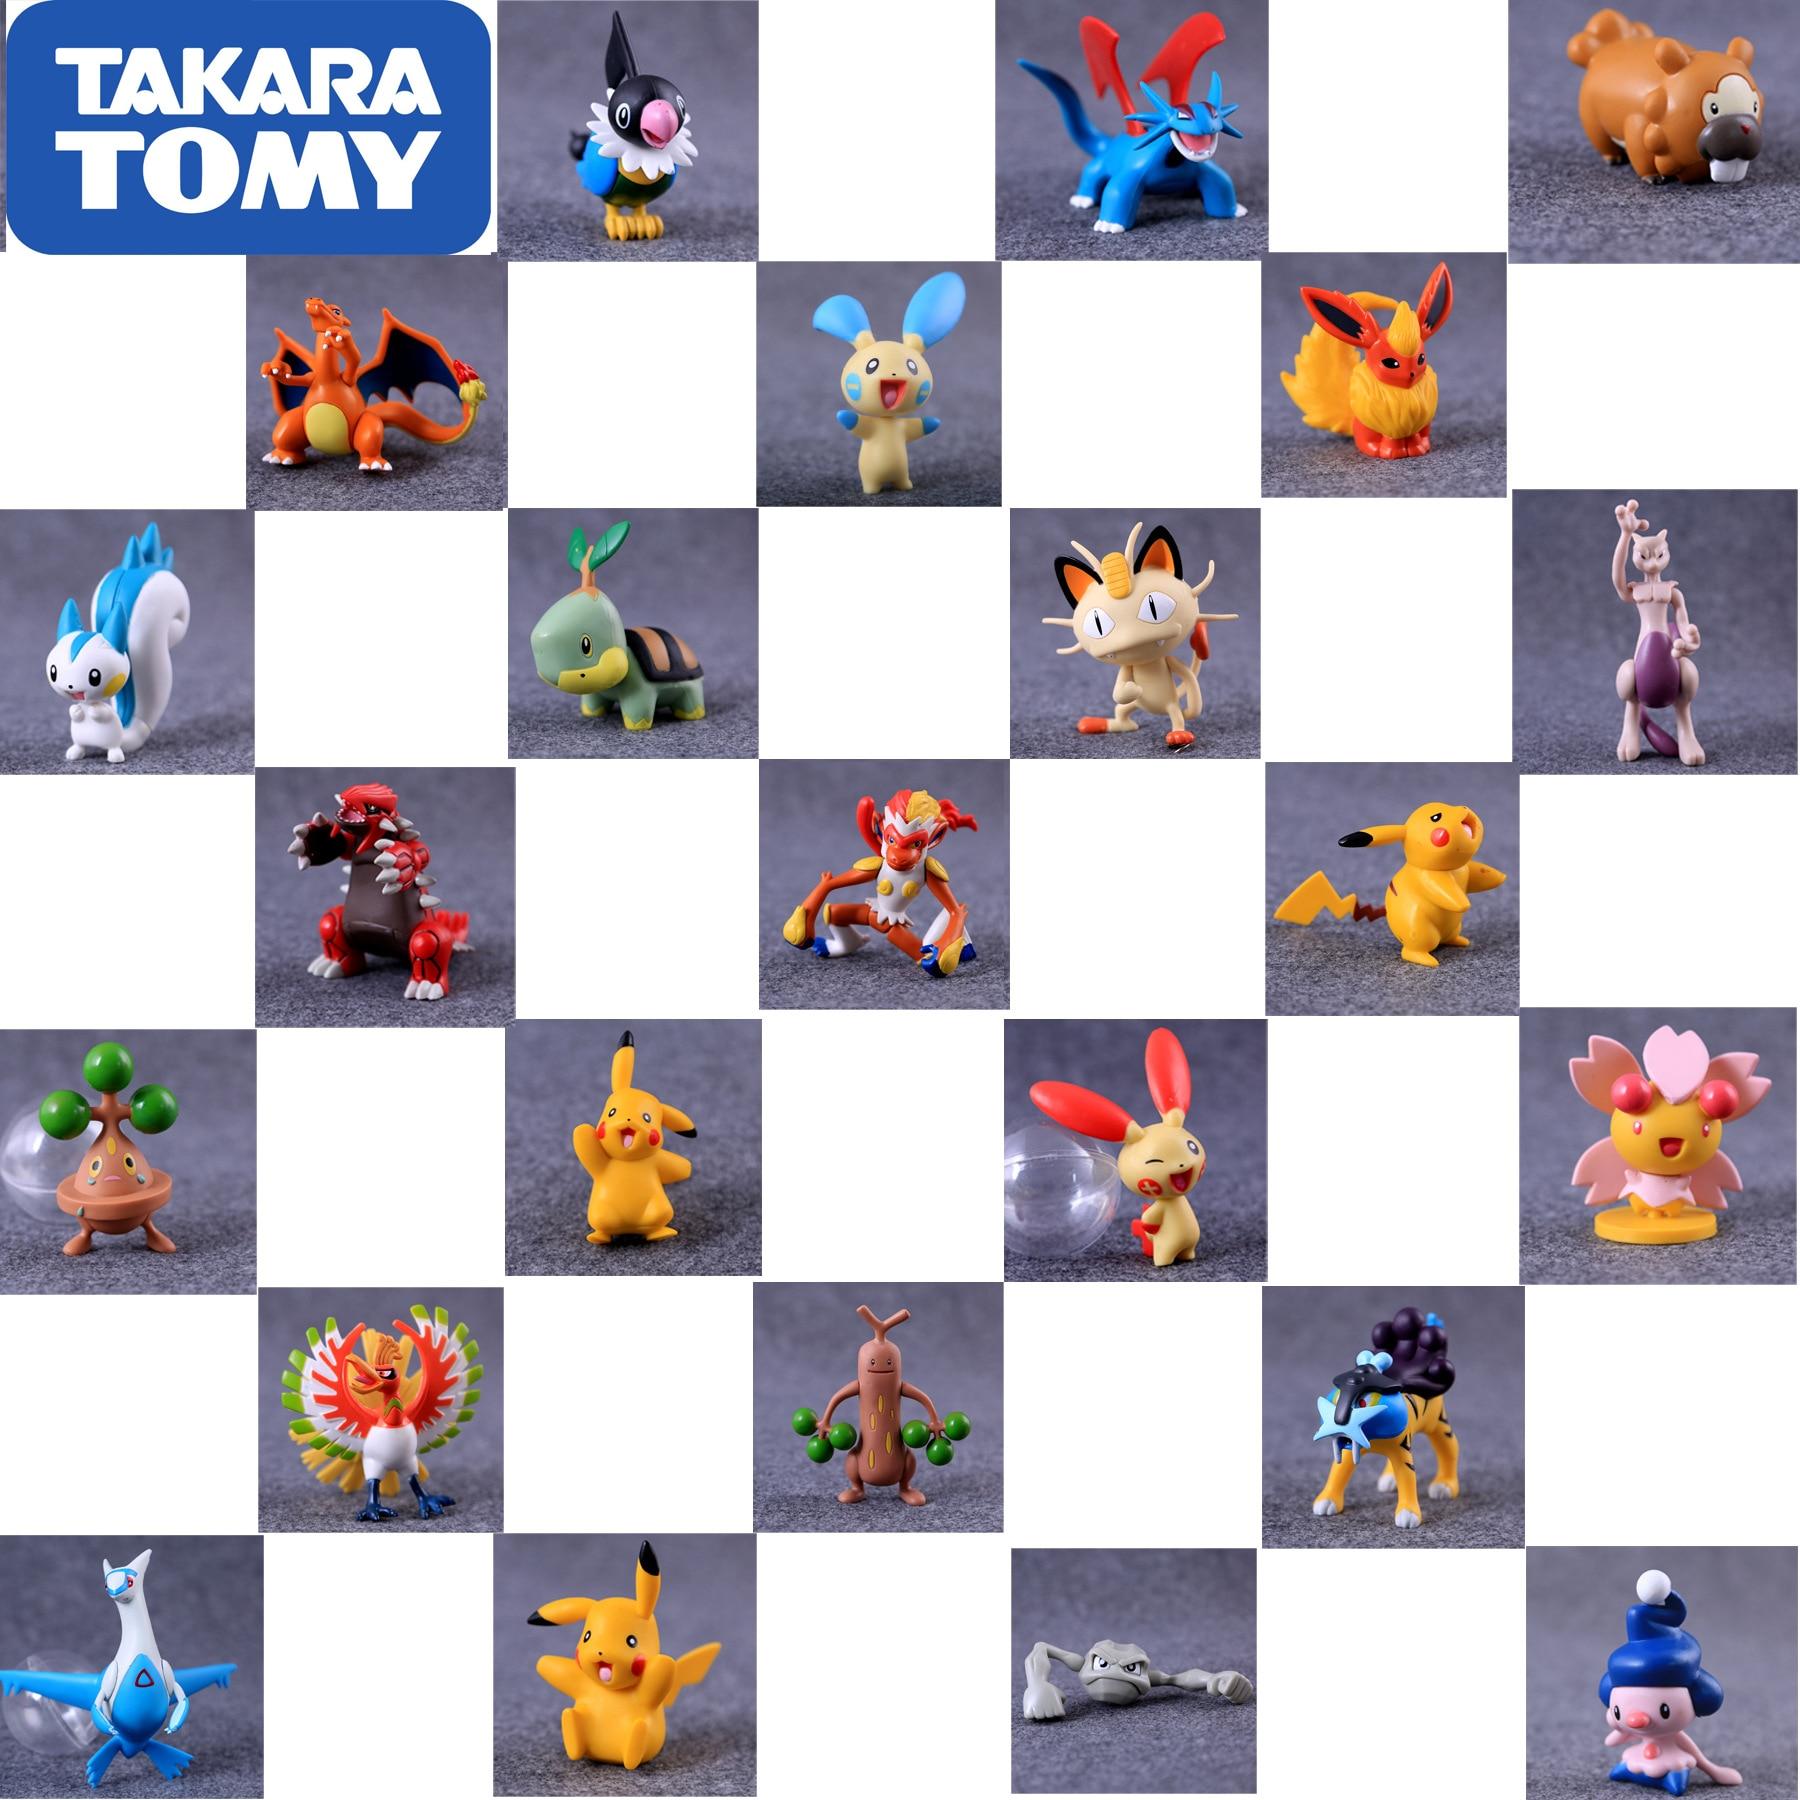 4-15cm Takara Tomy Pokemon Pikachu Wartortle Charmeleon Delphox Ivysaur Venusaur MEGA Anime Action & Toy Figures Model